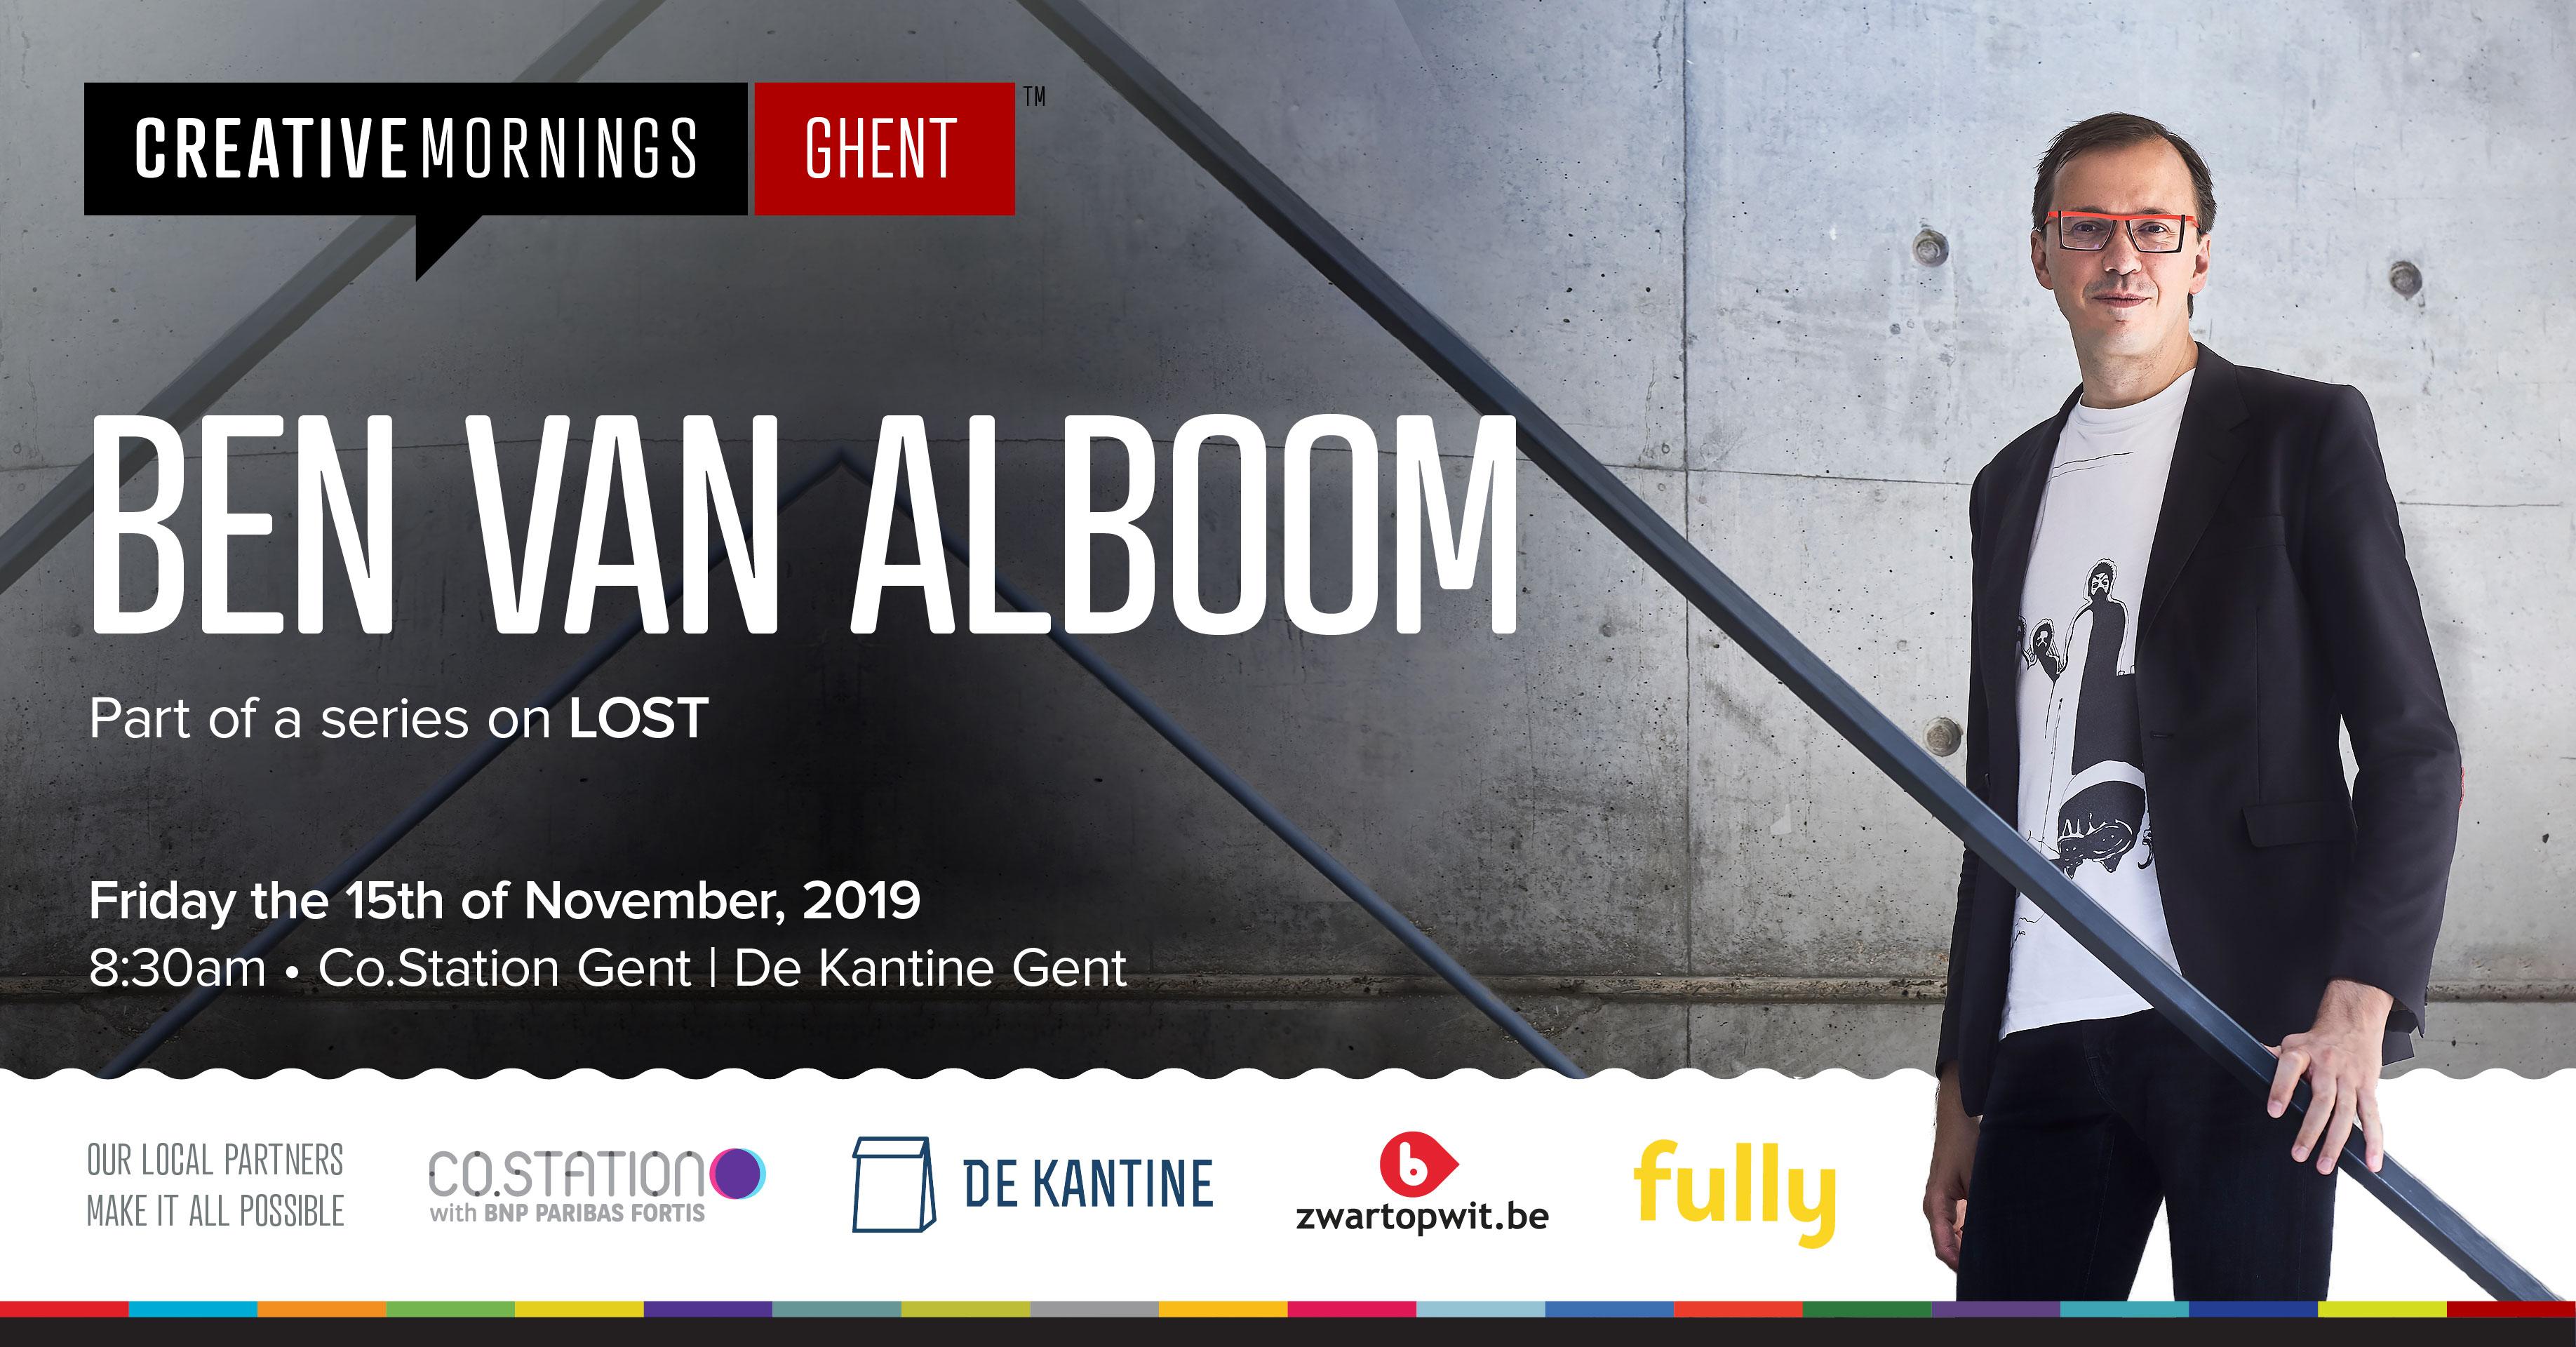 Ben Van Alboom at CreativeMornings/Ghent